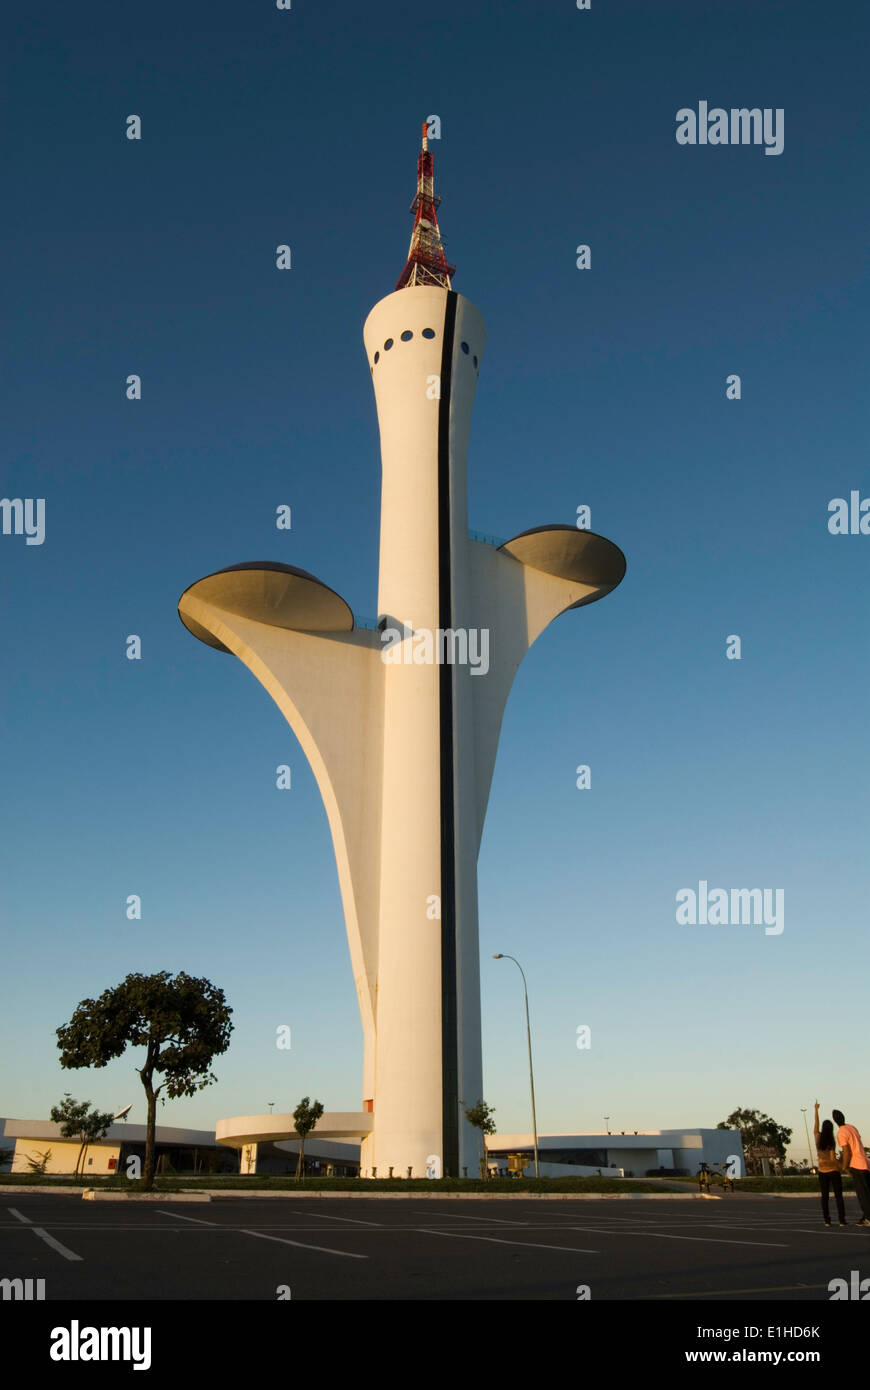 Brasilia Digital TV Tower - Stock Image